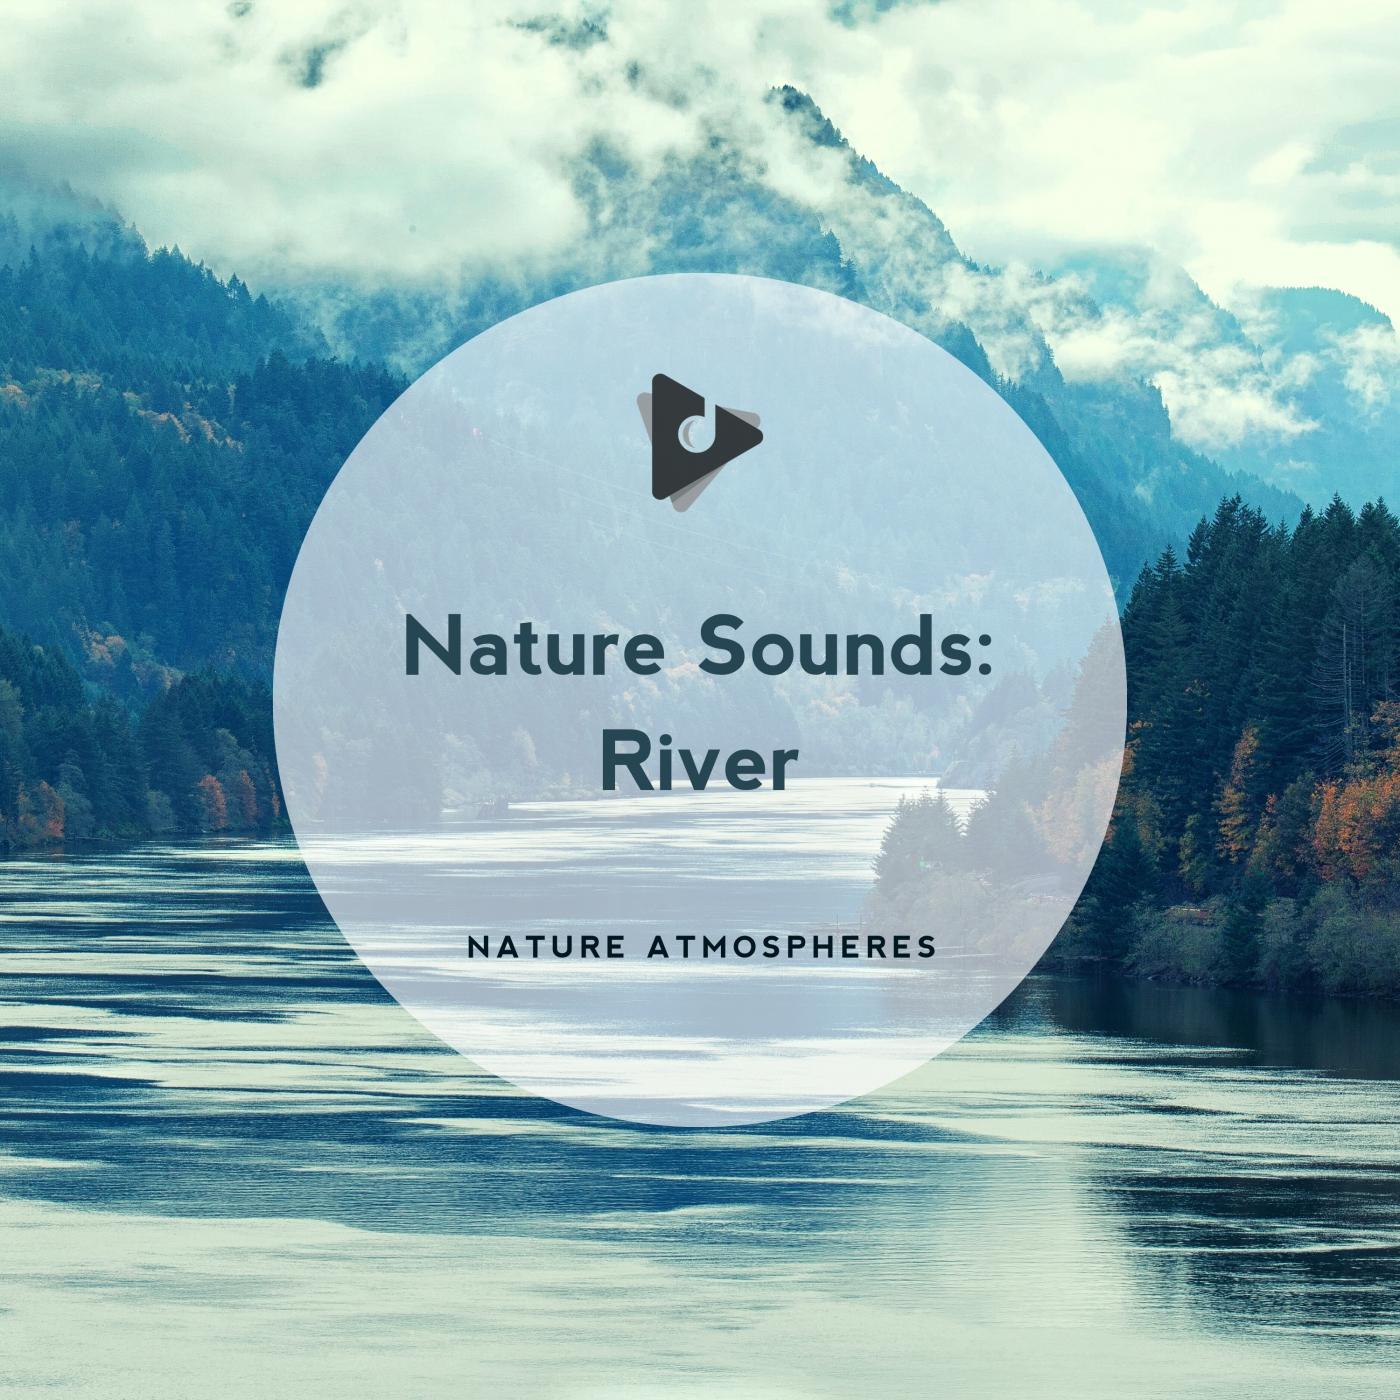 Nature Sounds: River